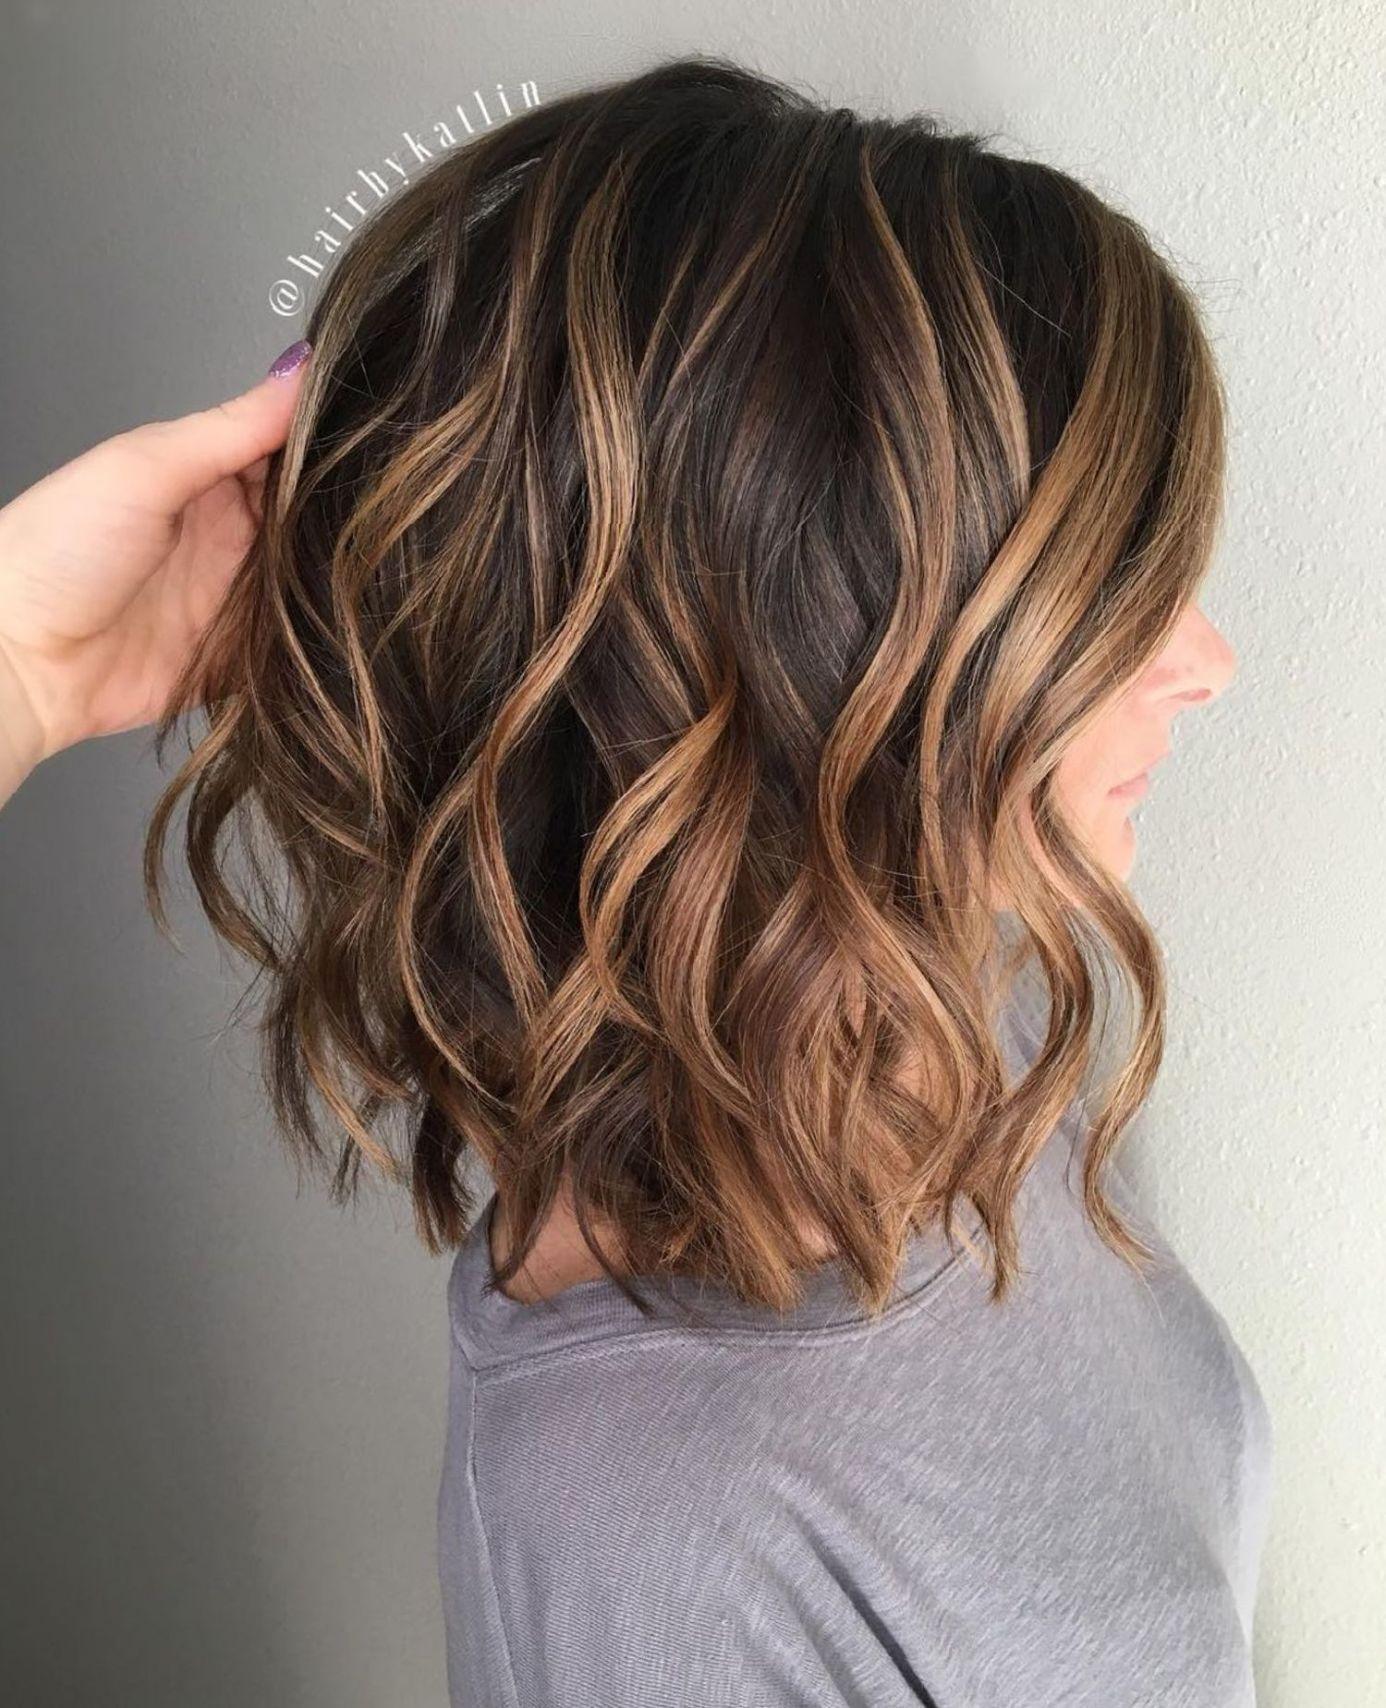 Caramel Highlights For Medium Brown Hair Medium Hair Styles Hair Lengths Dark Chocolate Hair